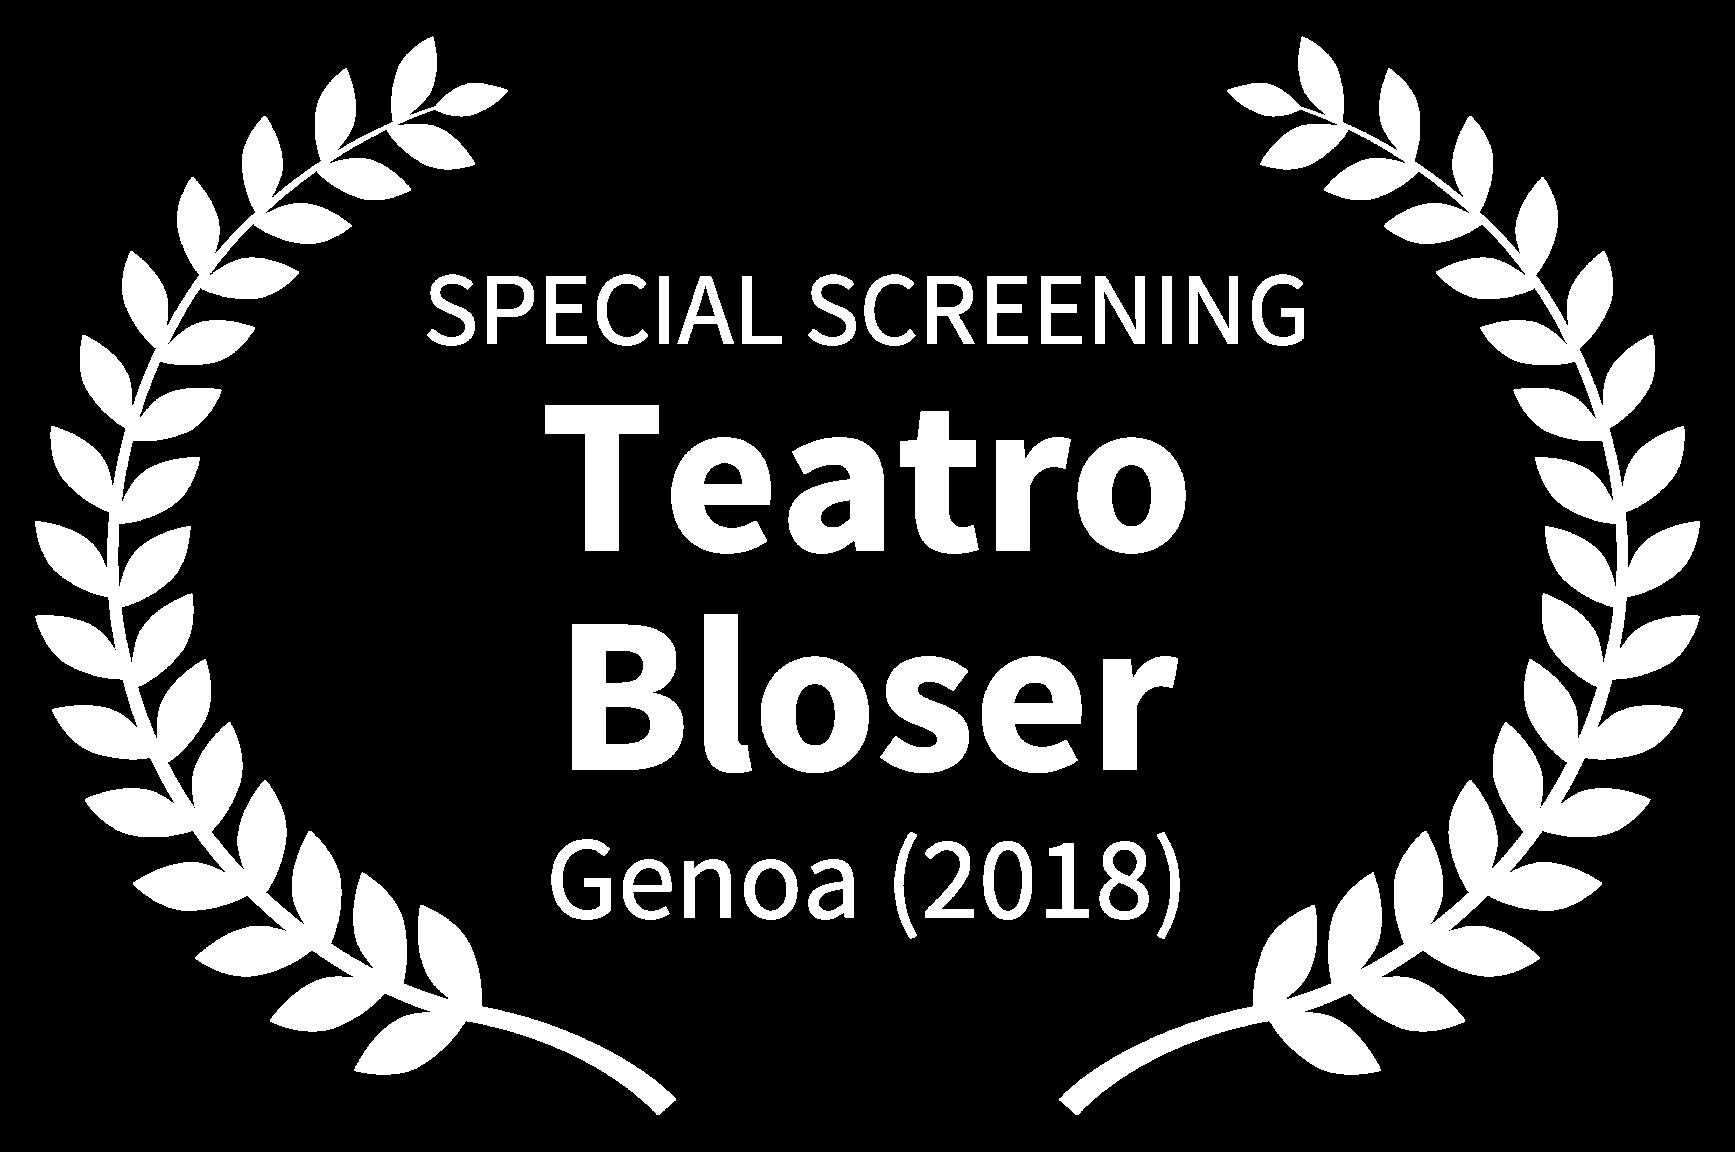 SPECIAL SCREENING - Teatro Bloser - Genoa 2018